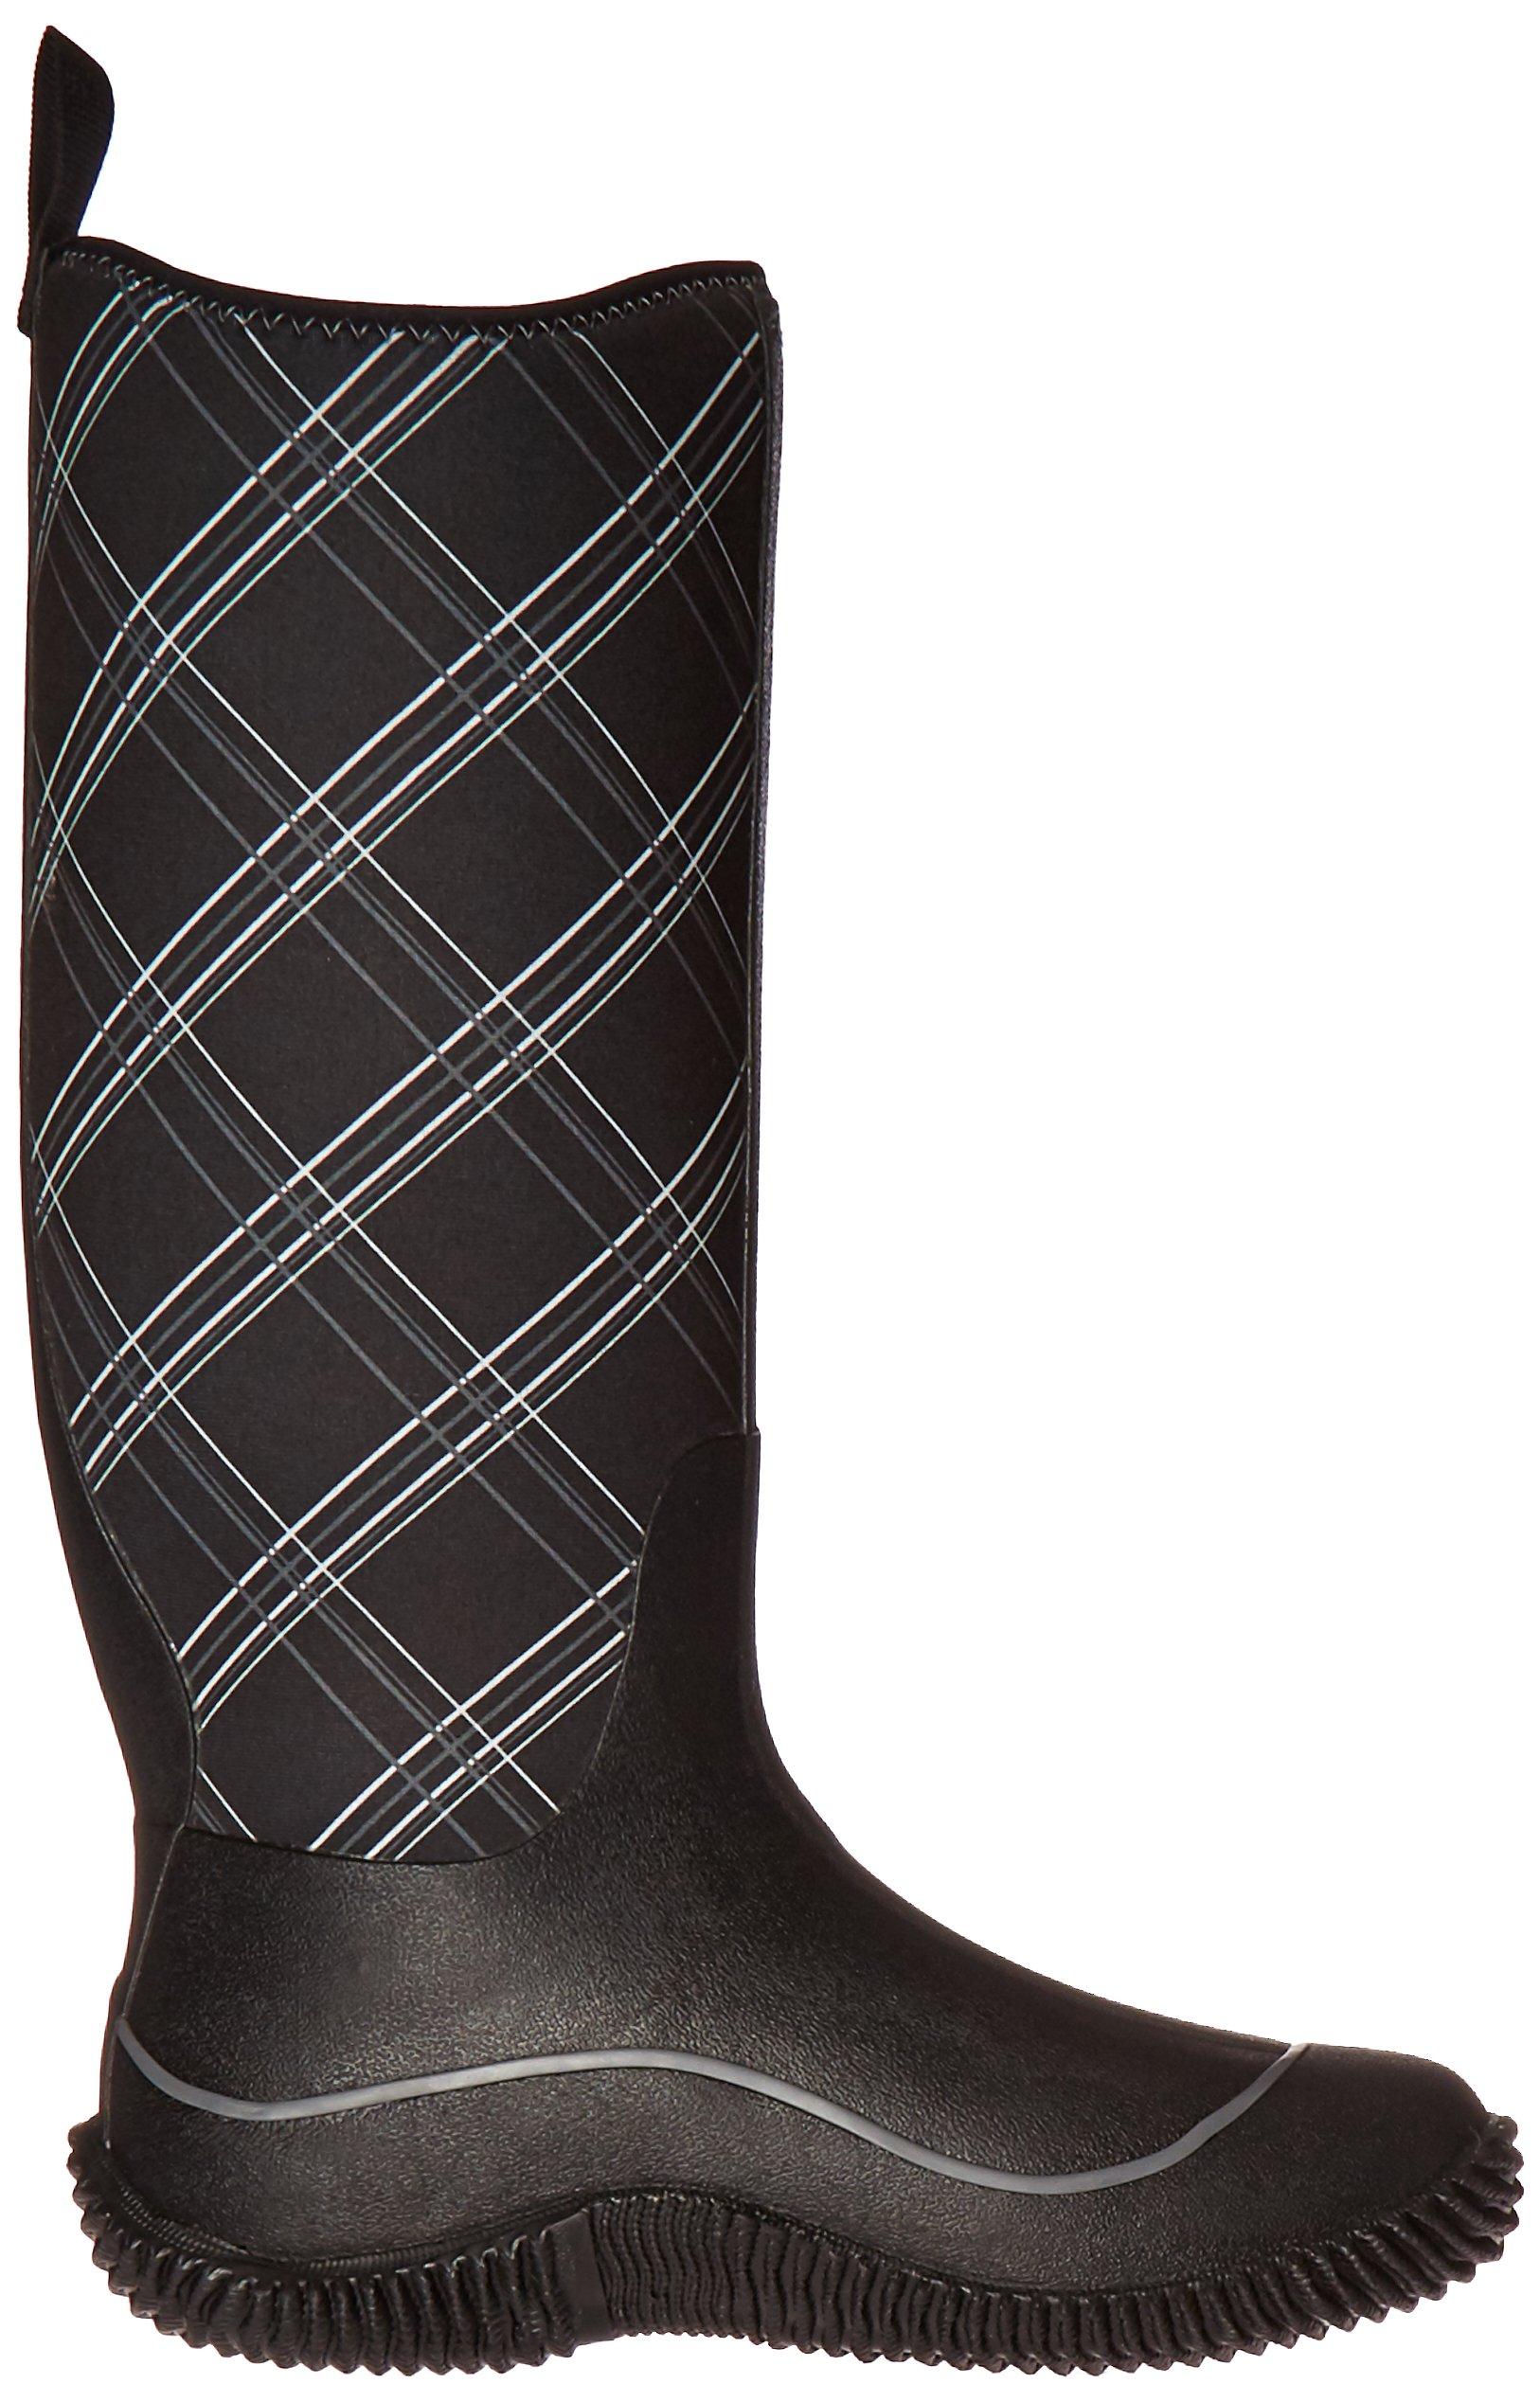 Muck Hale Multi-Season Women's Rubber Boots by Muck Boot (Image #7)